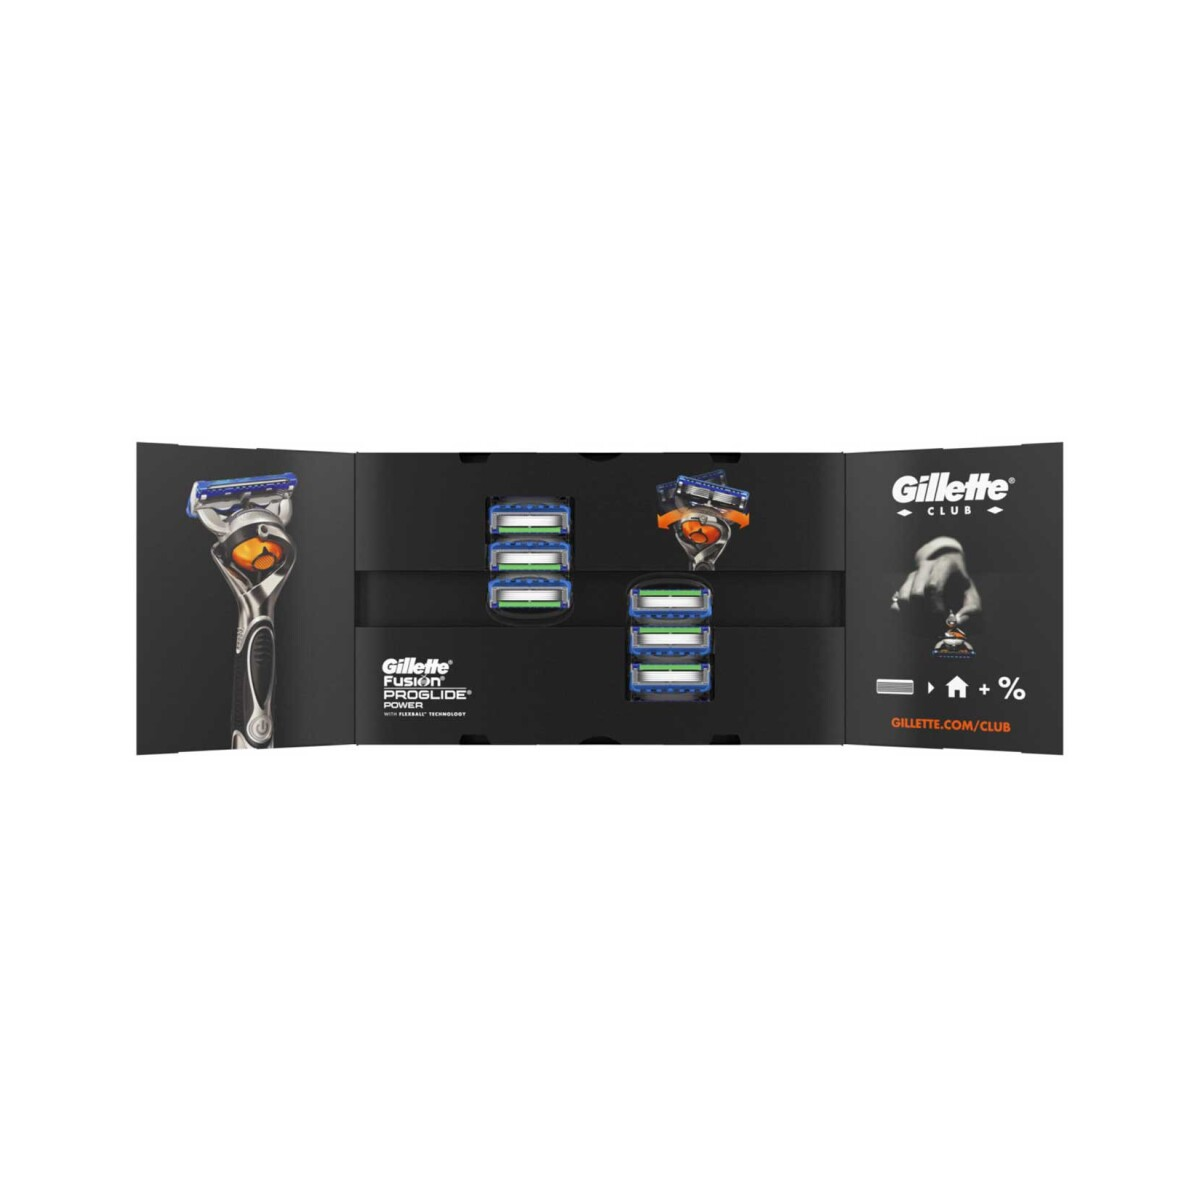 Gillette Fusion Power Yedek Tıraş Bıçağı Karton Paket 8'Li